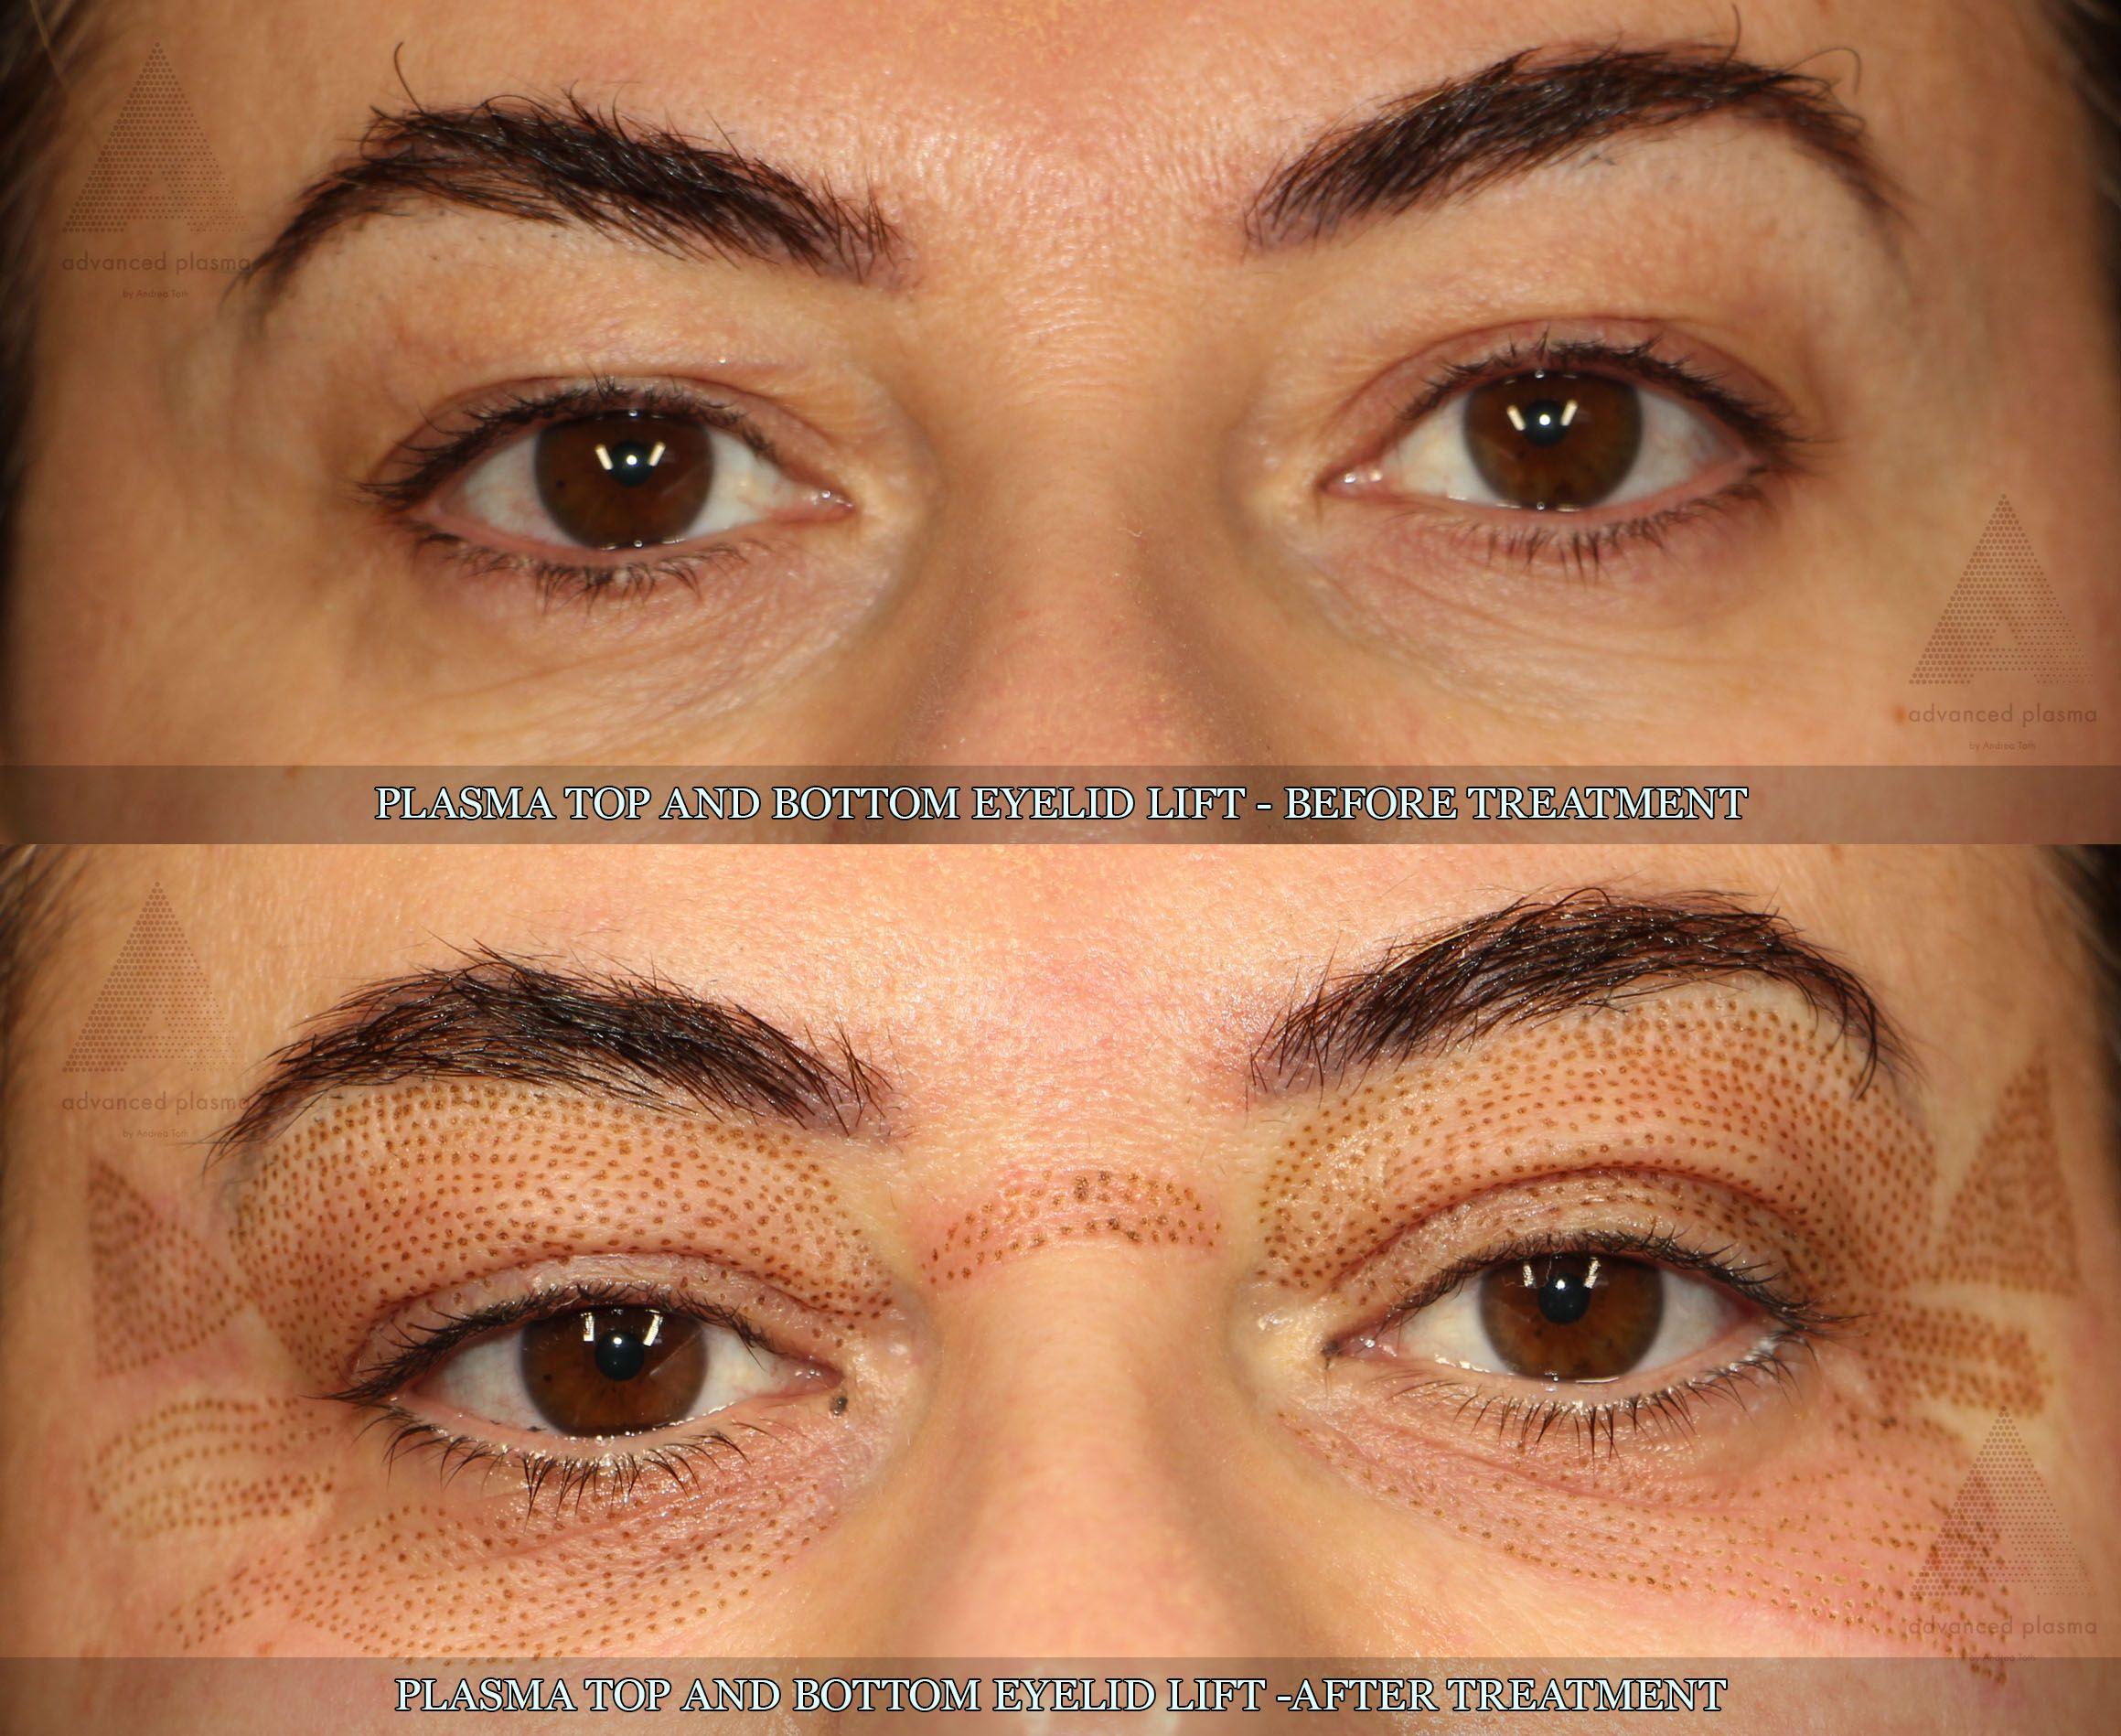 Pin By Angela Loiselle On Plasma Skin Tightening Treatments Eyelid Lift Radio Frequency Skin Tightening